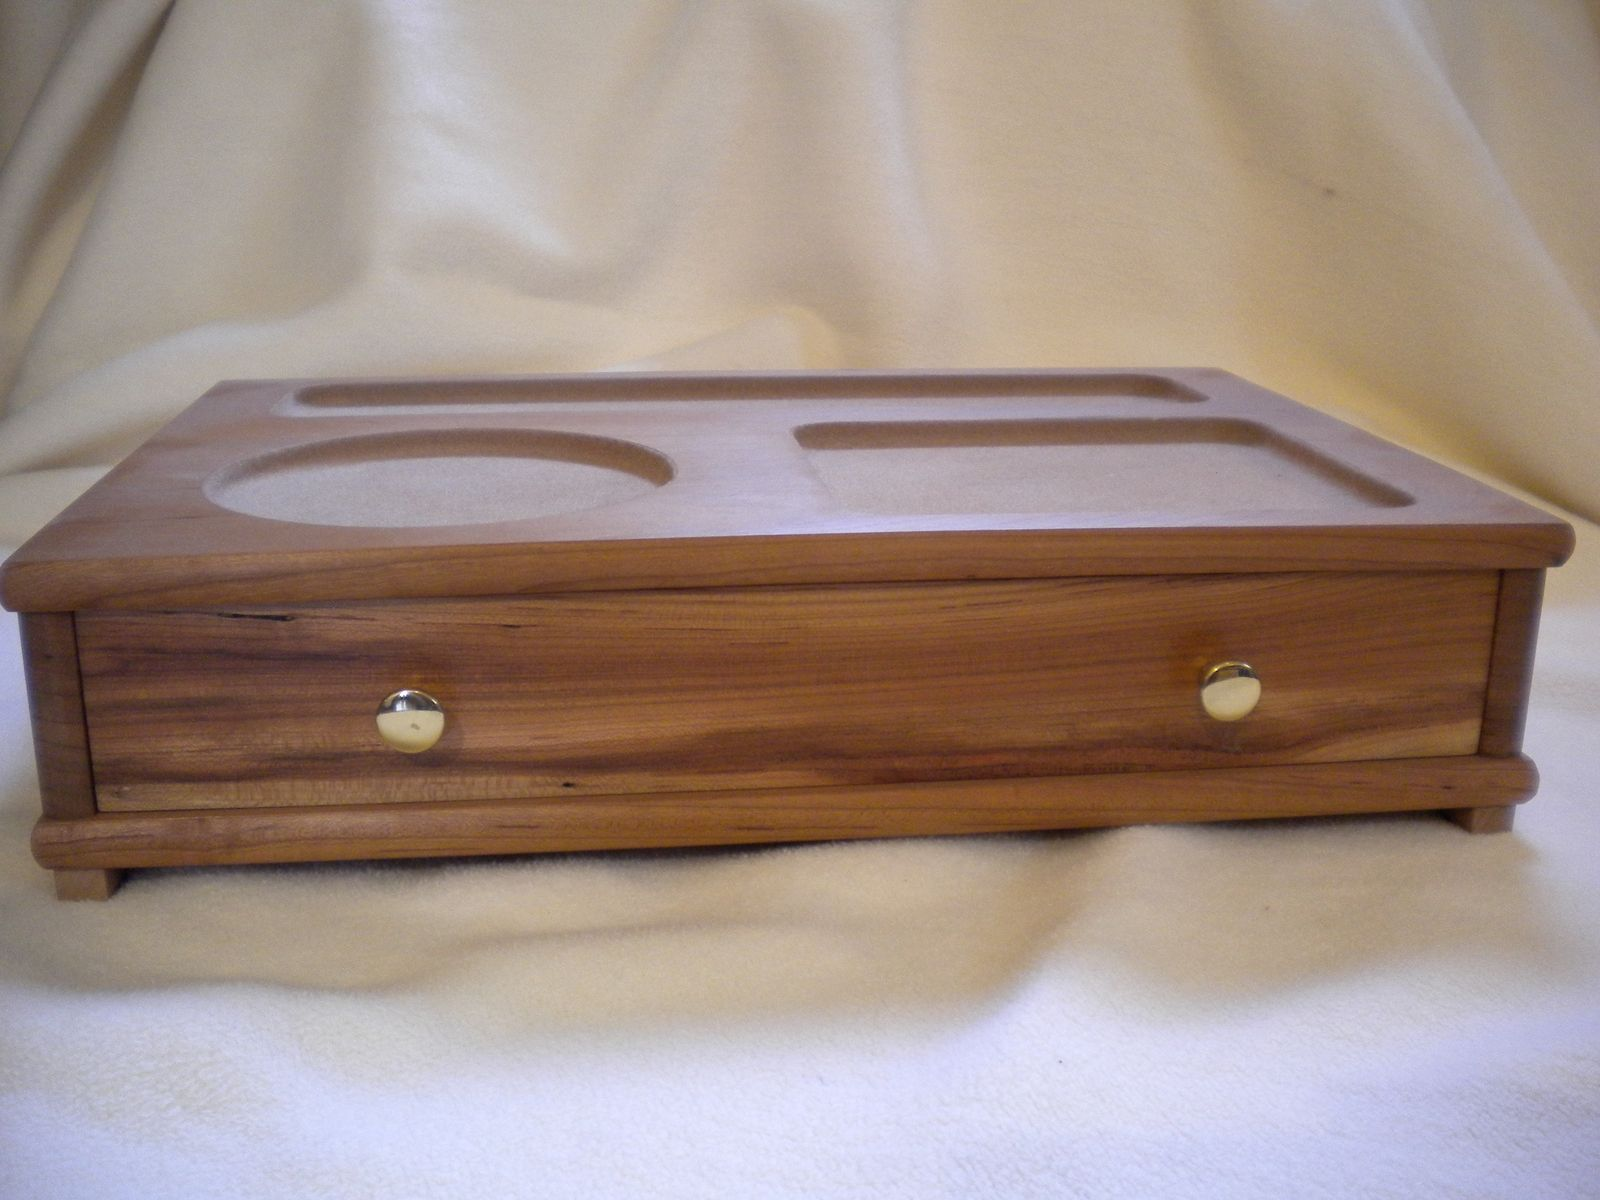 Handmade Dresser Top Valet Or Desk Organizer by Oregon